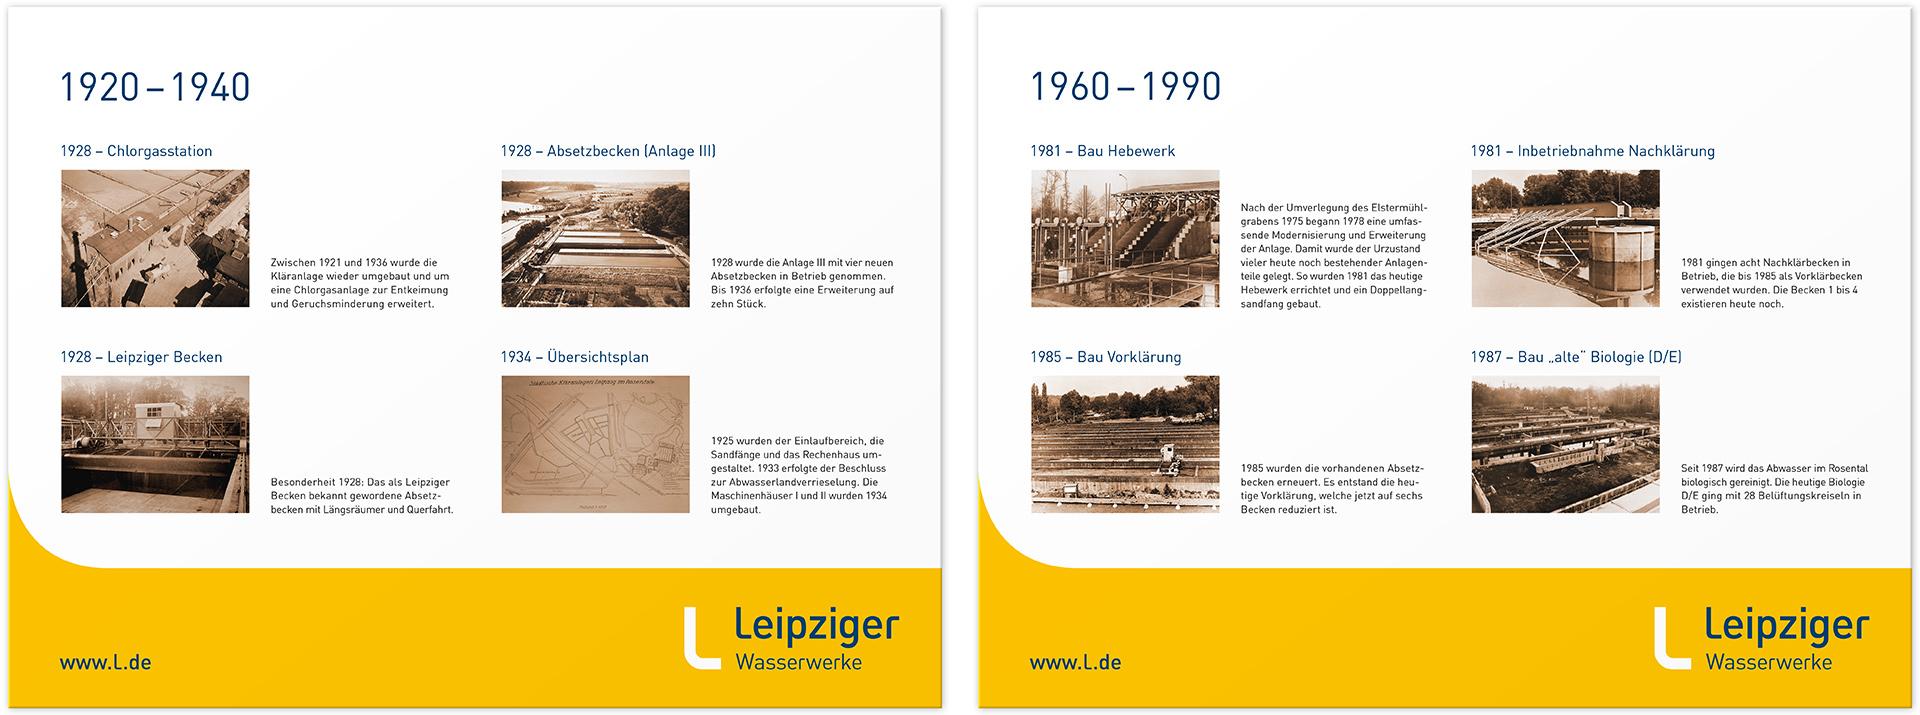 Historische Tafeln 1920 – 1990